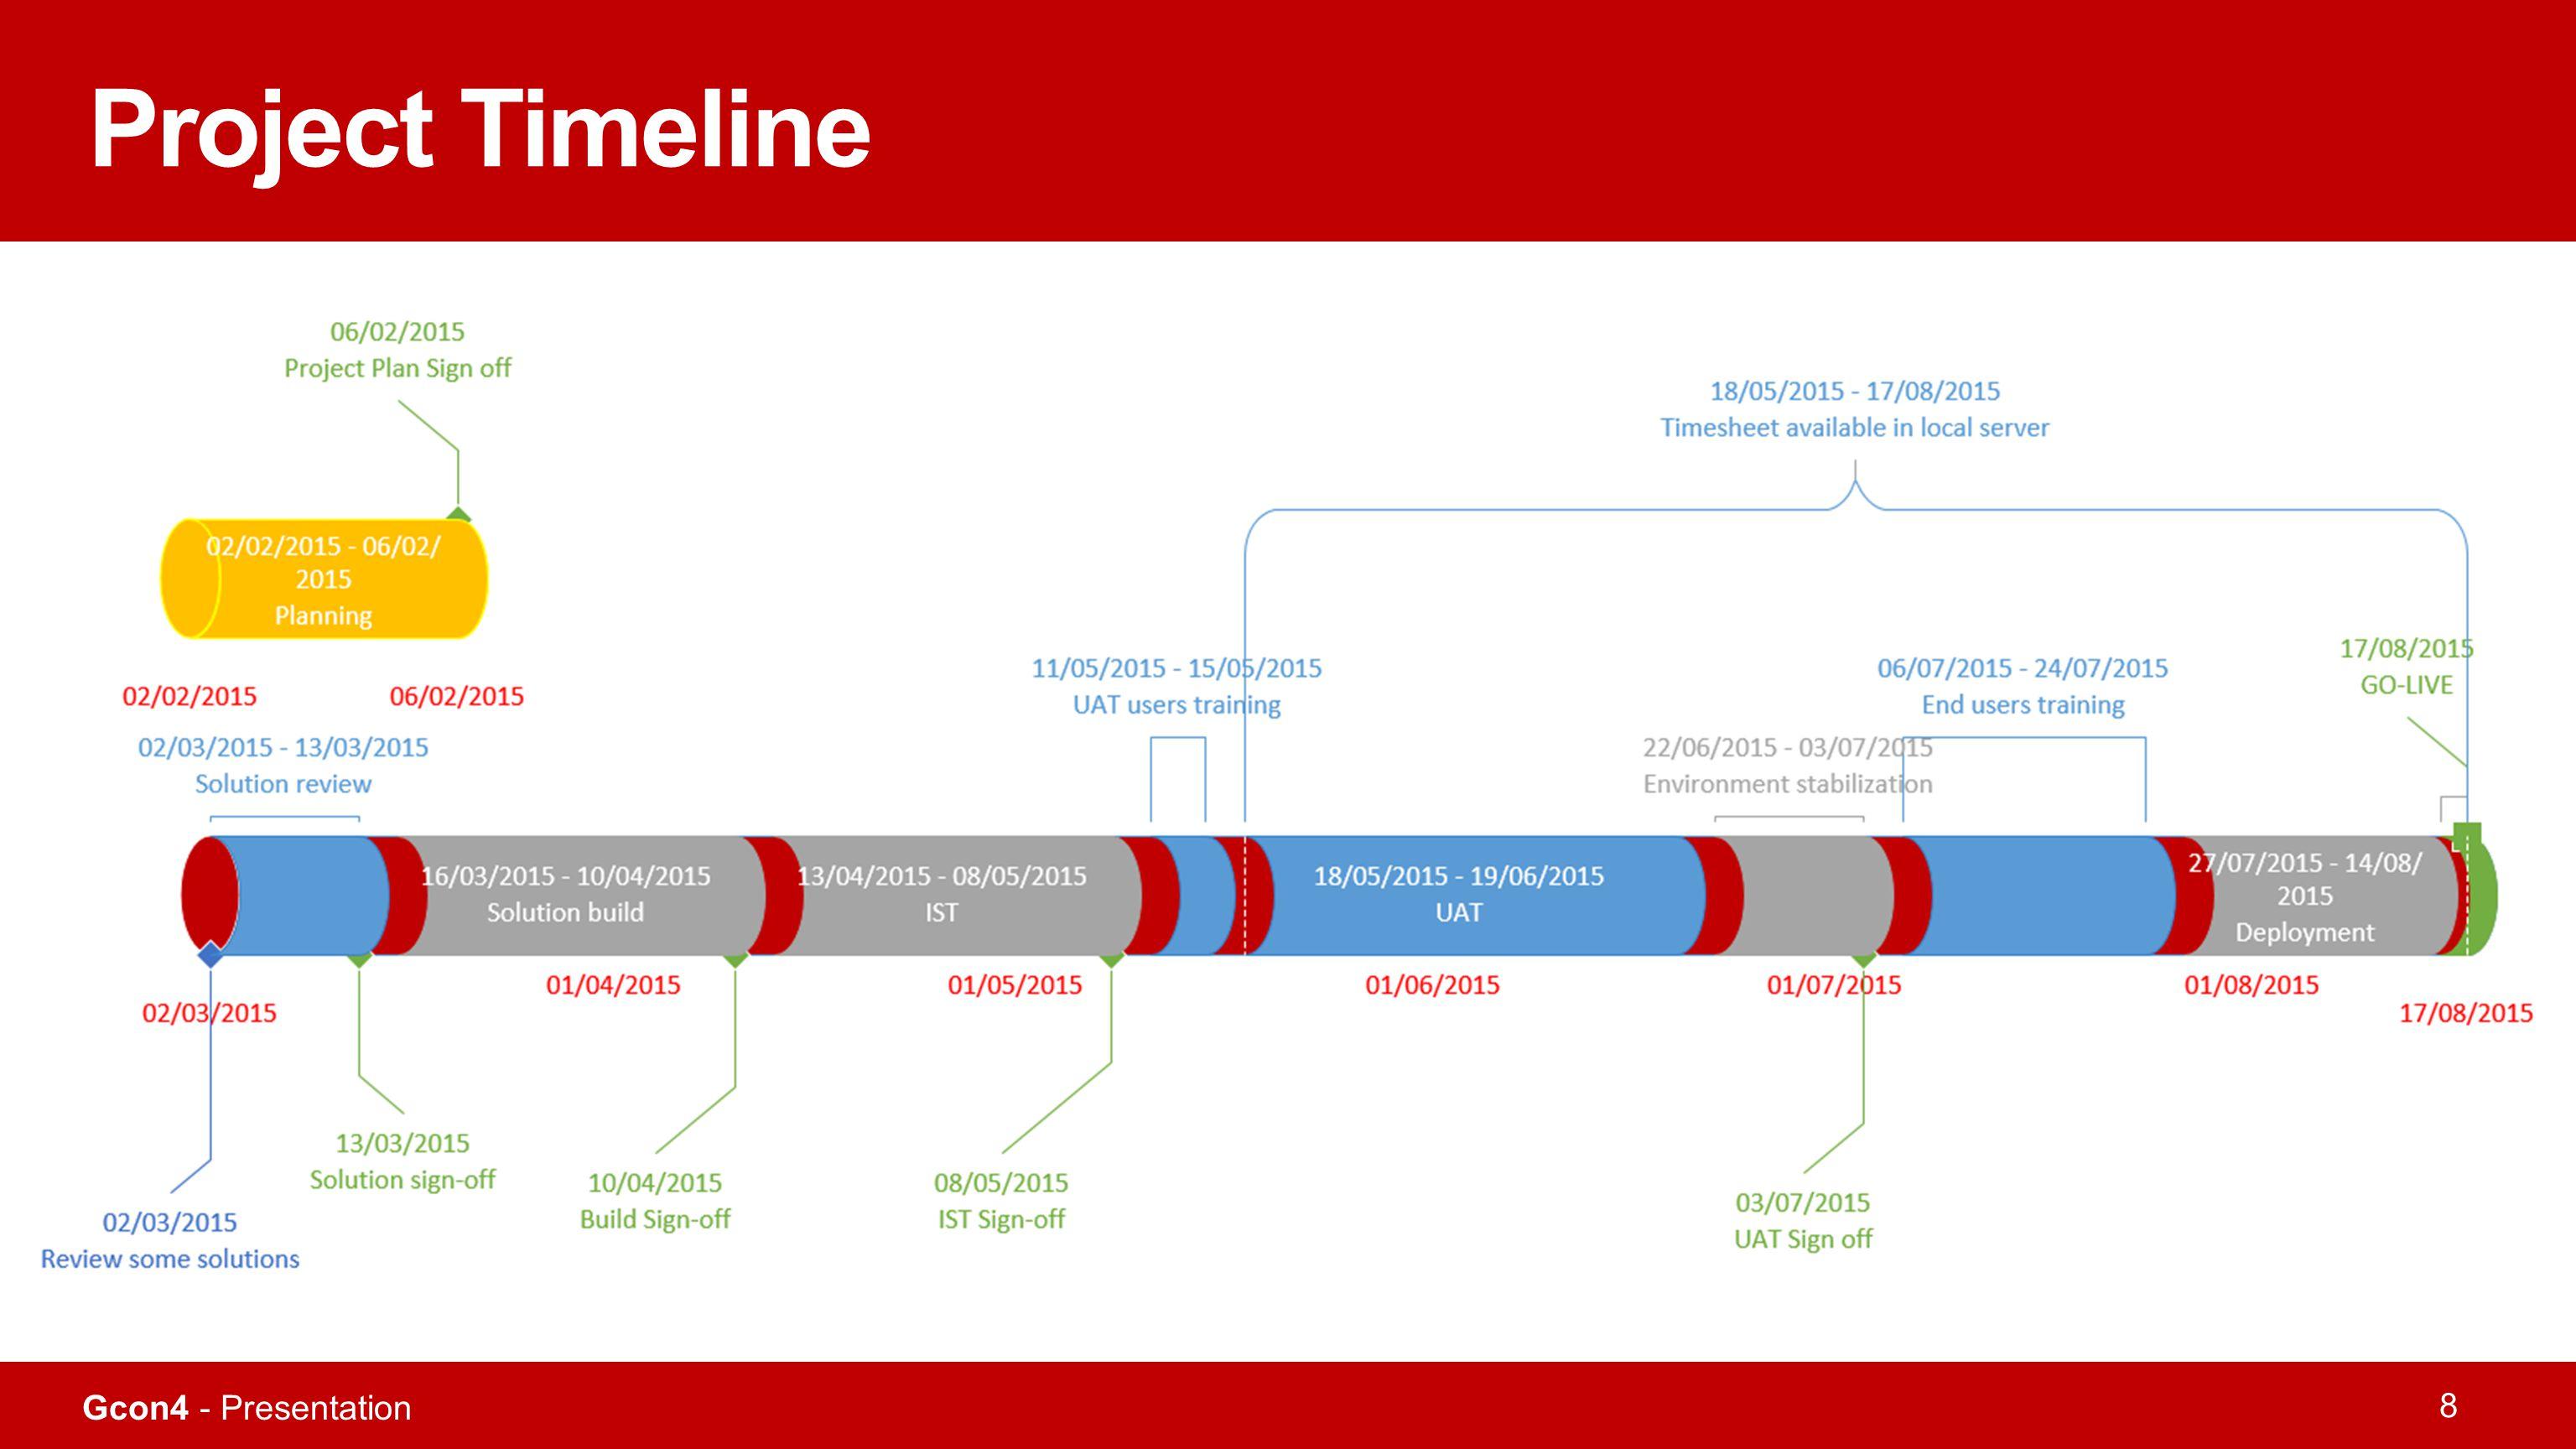 Gcon4 - Presentation 8 Project Timeline